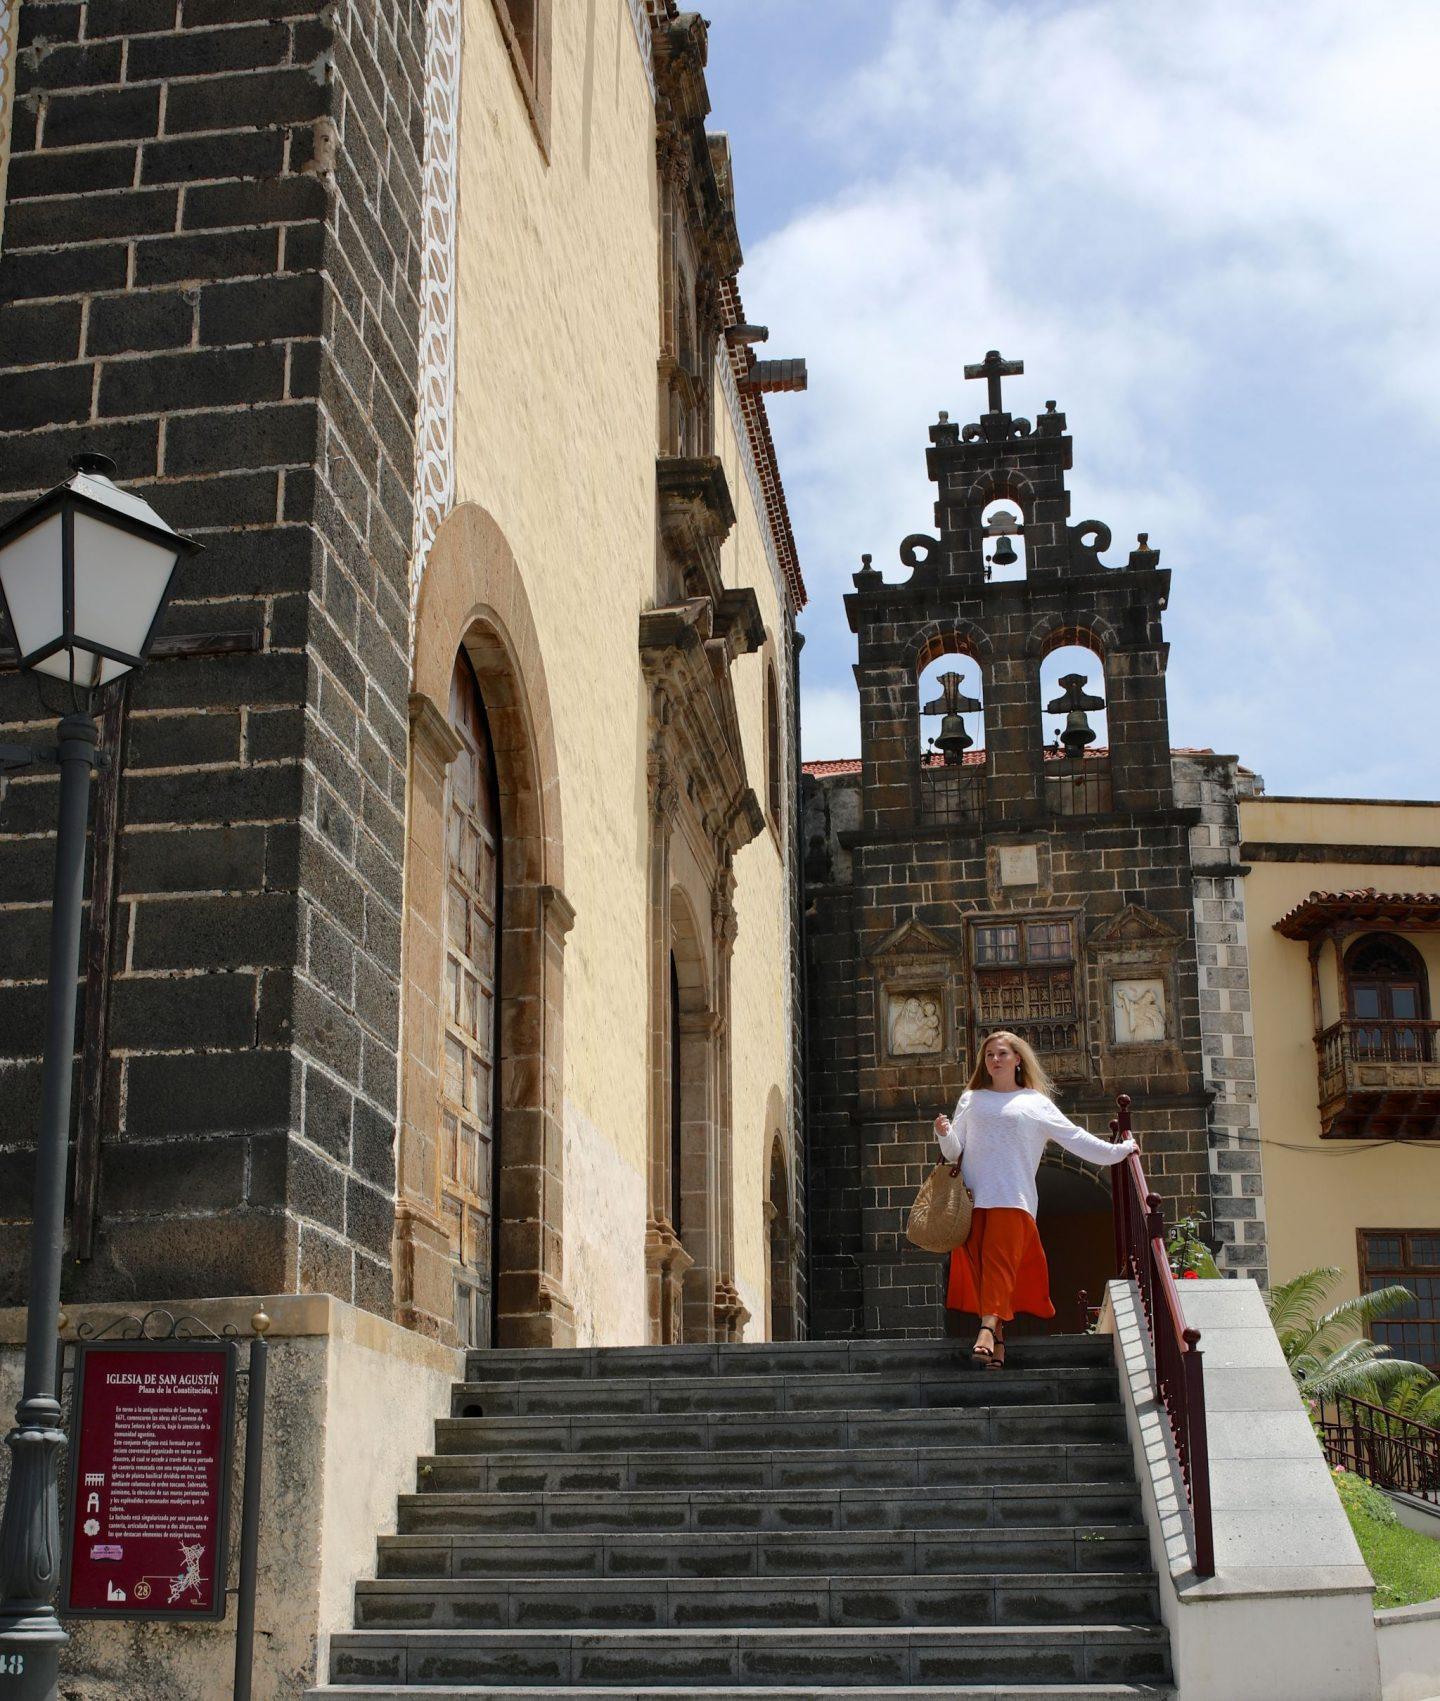 Tasca El Bulli Cio, La Orotava, Tenerife, Canary Islands, Katie Heath, KALANCHOE